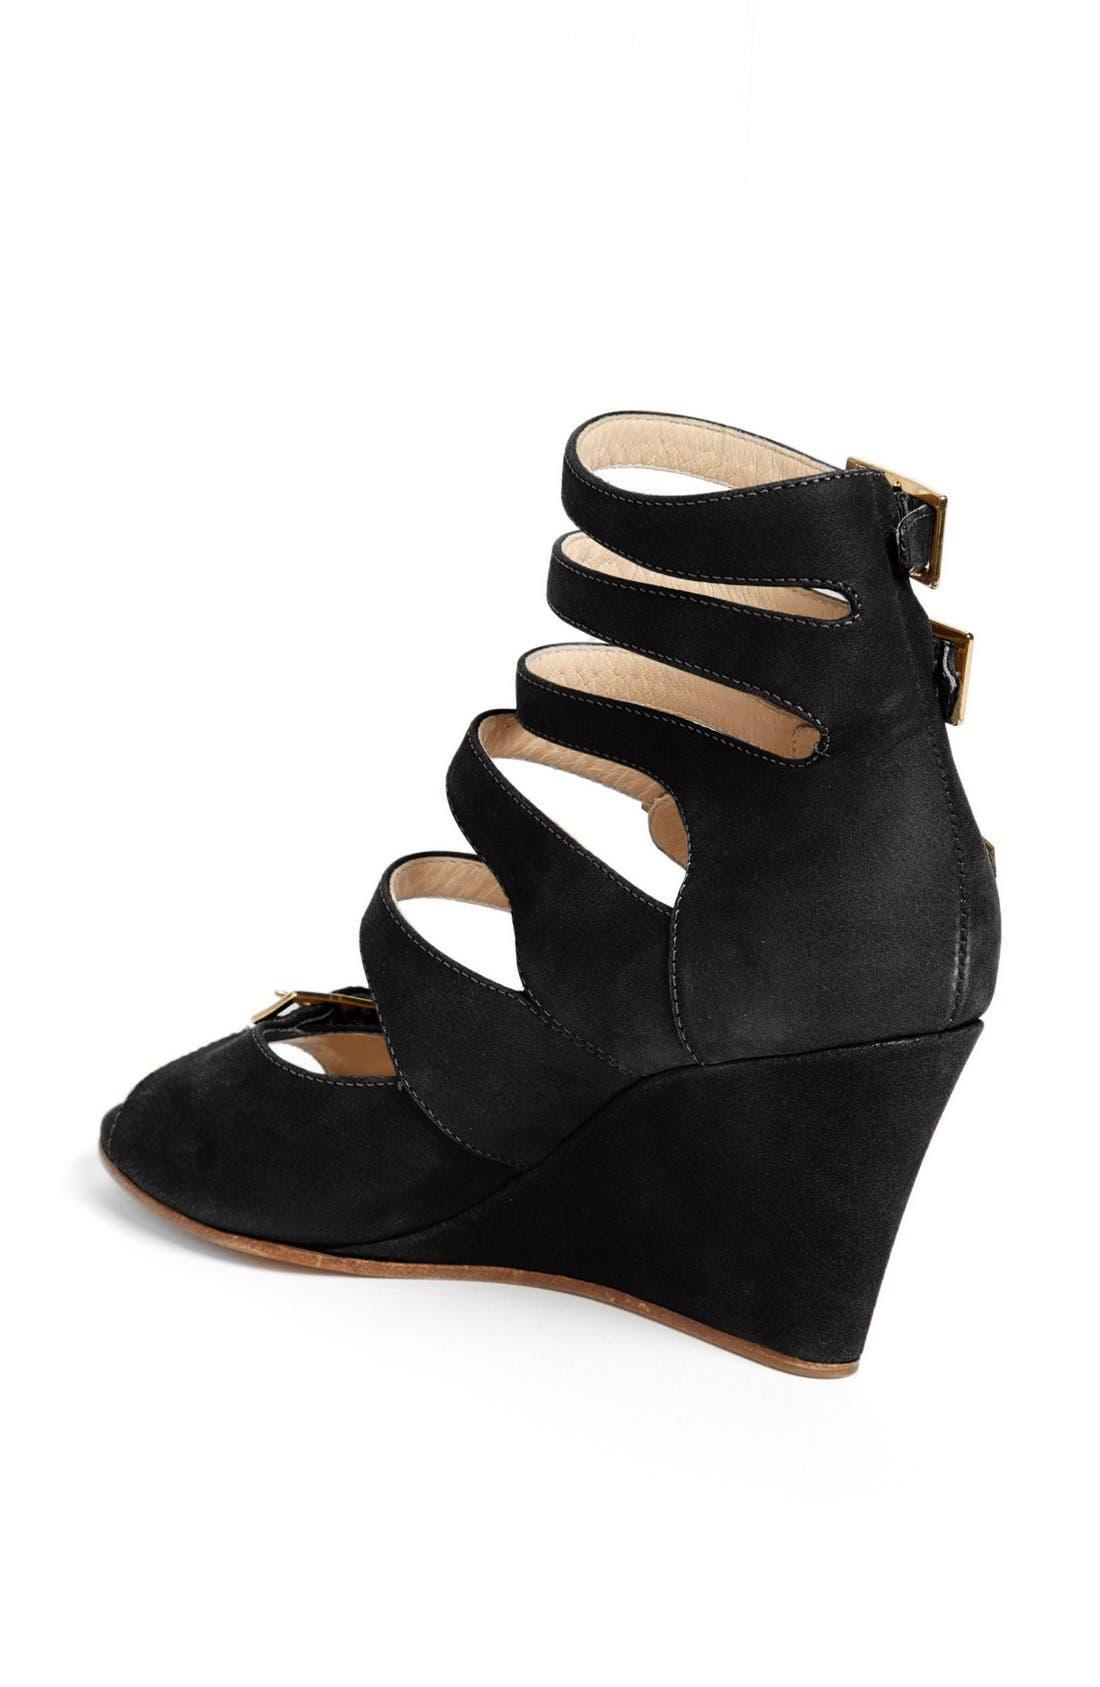 Alternate Image 2  - Chloé 'Arce' Multi Strap Wedge Sandal